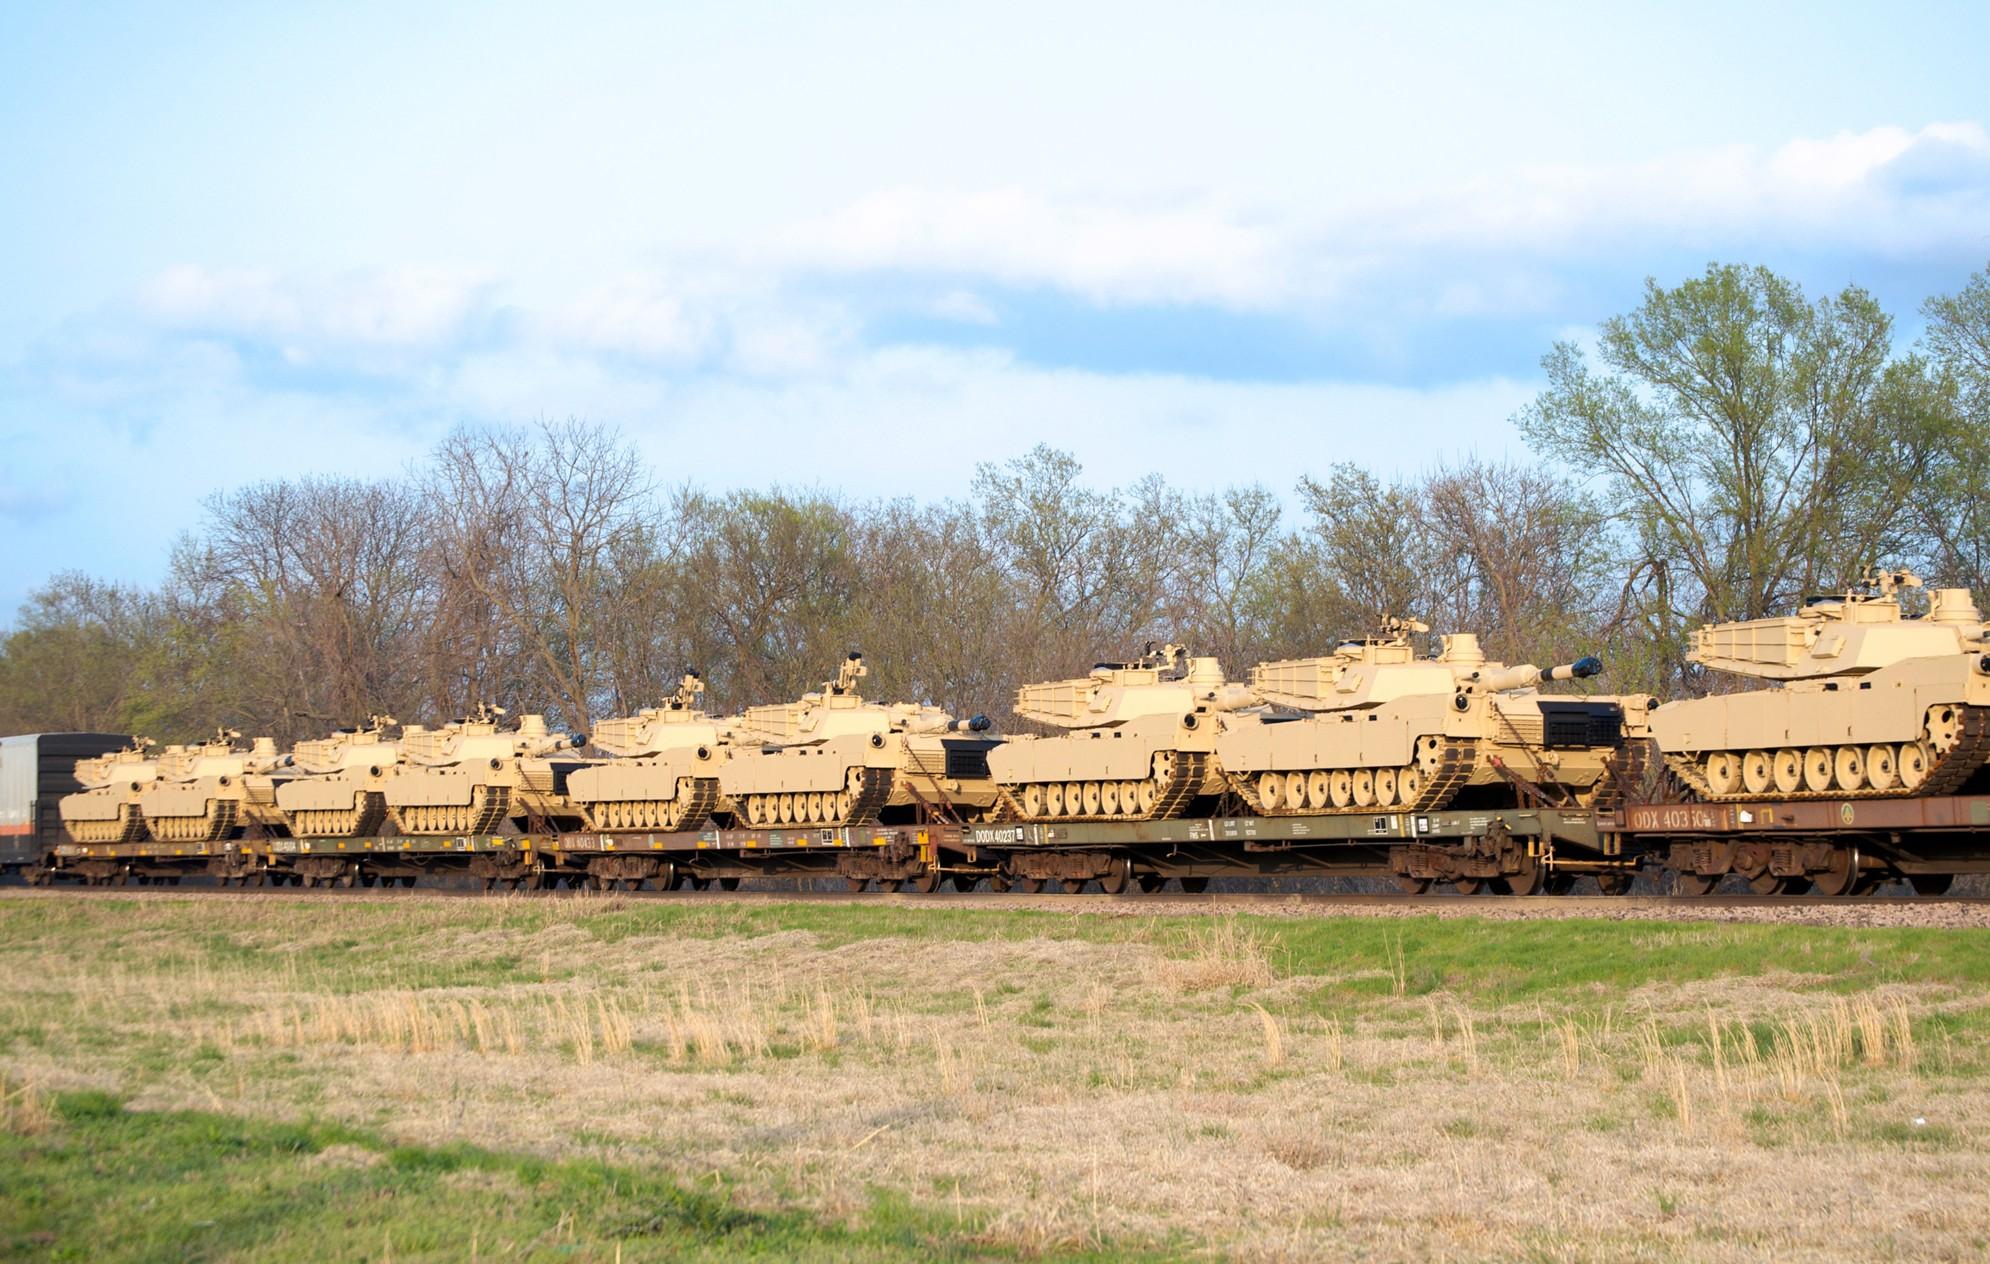 bnsf m1 abrams tanks